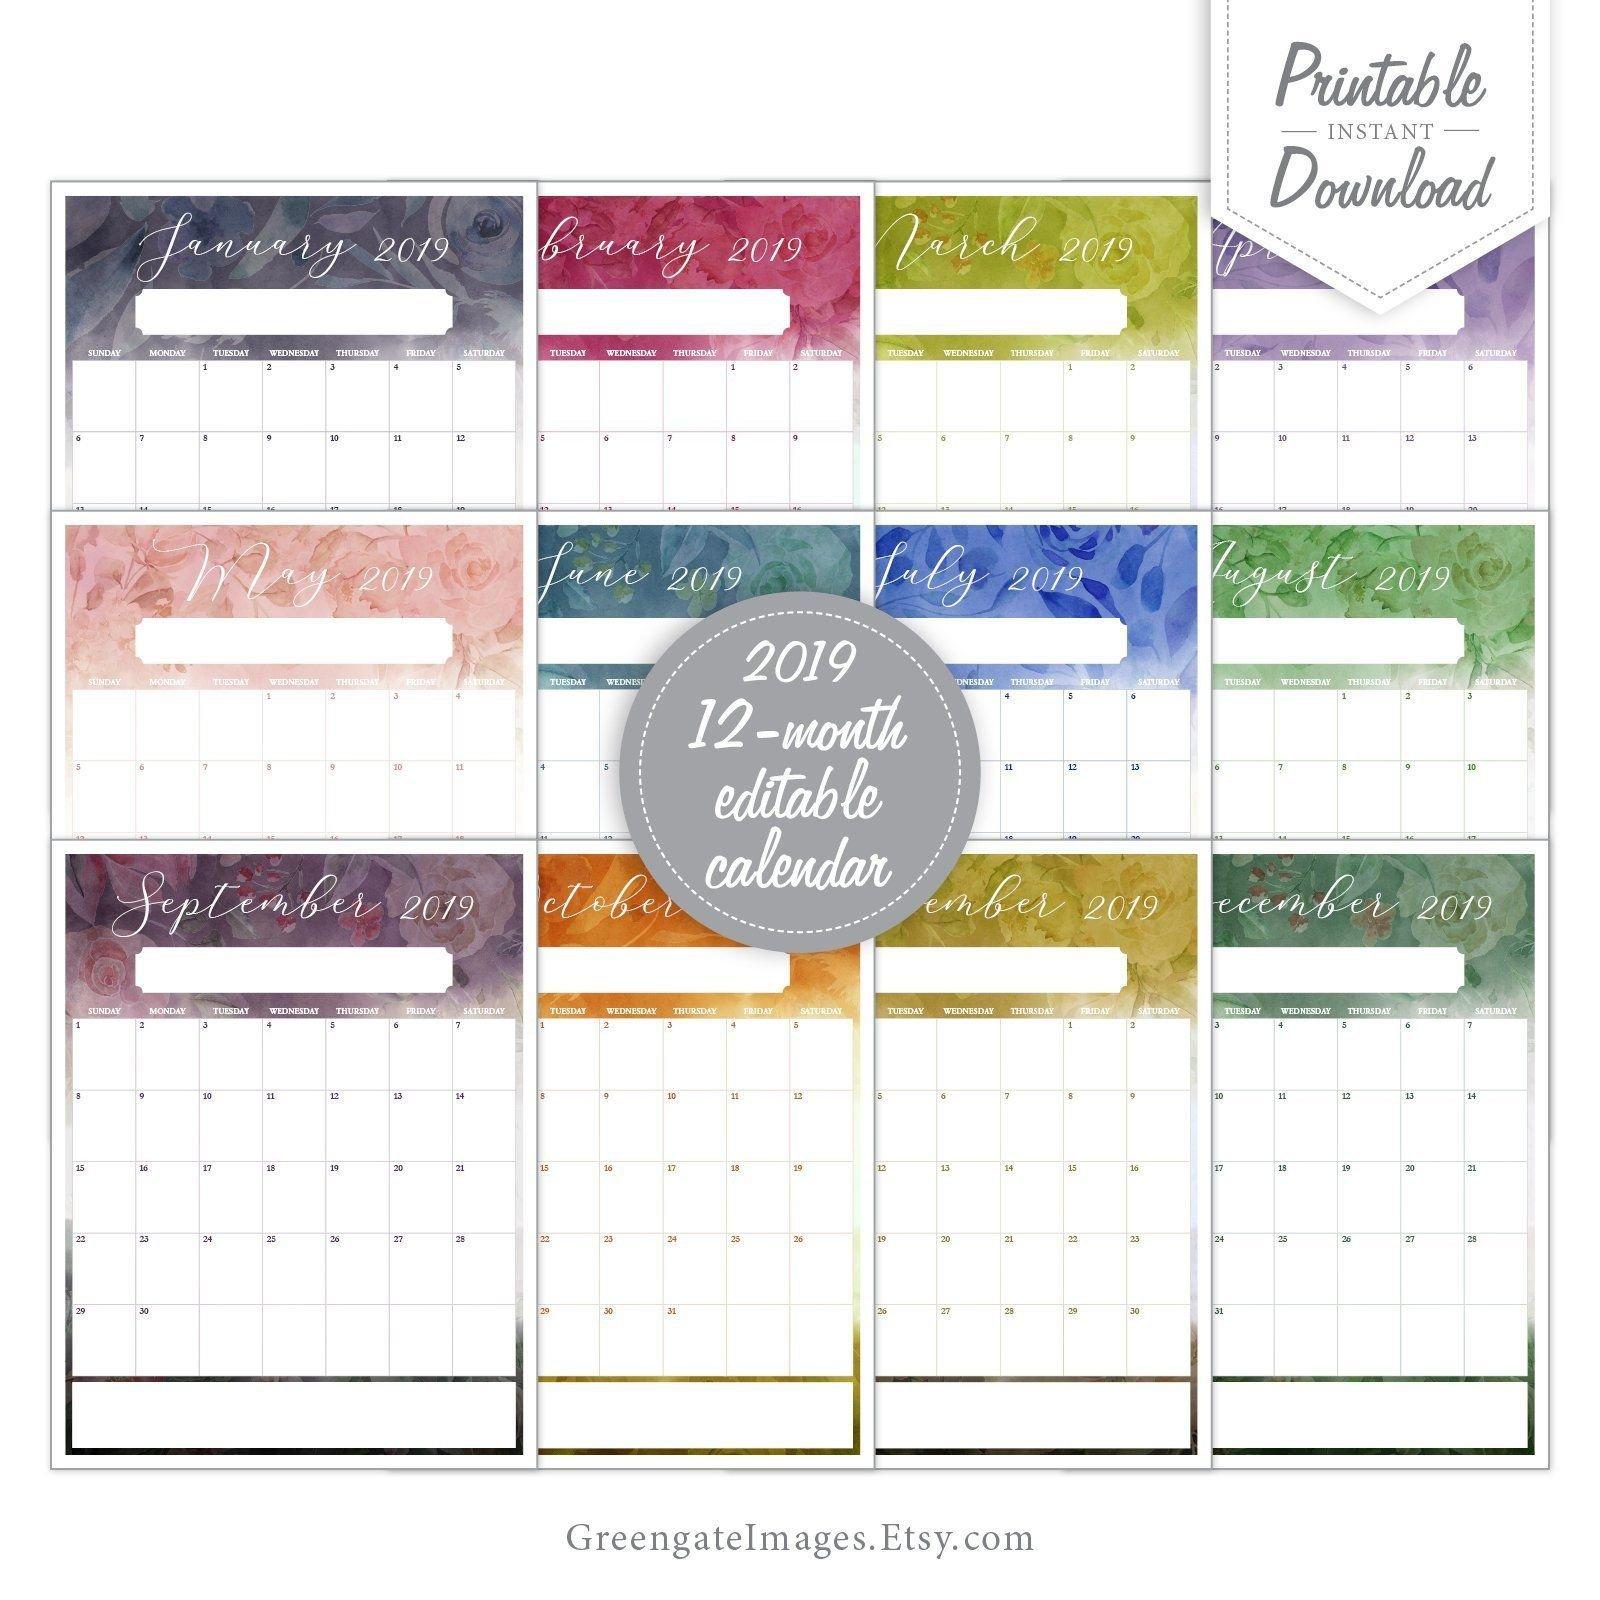 2019 Editable Calendar – Fillable Calendar, 12 Month 12 Months Calendar Editable